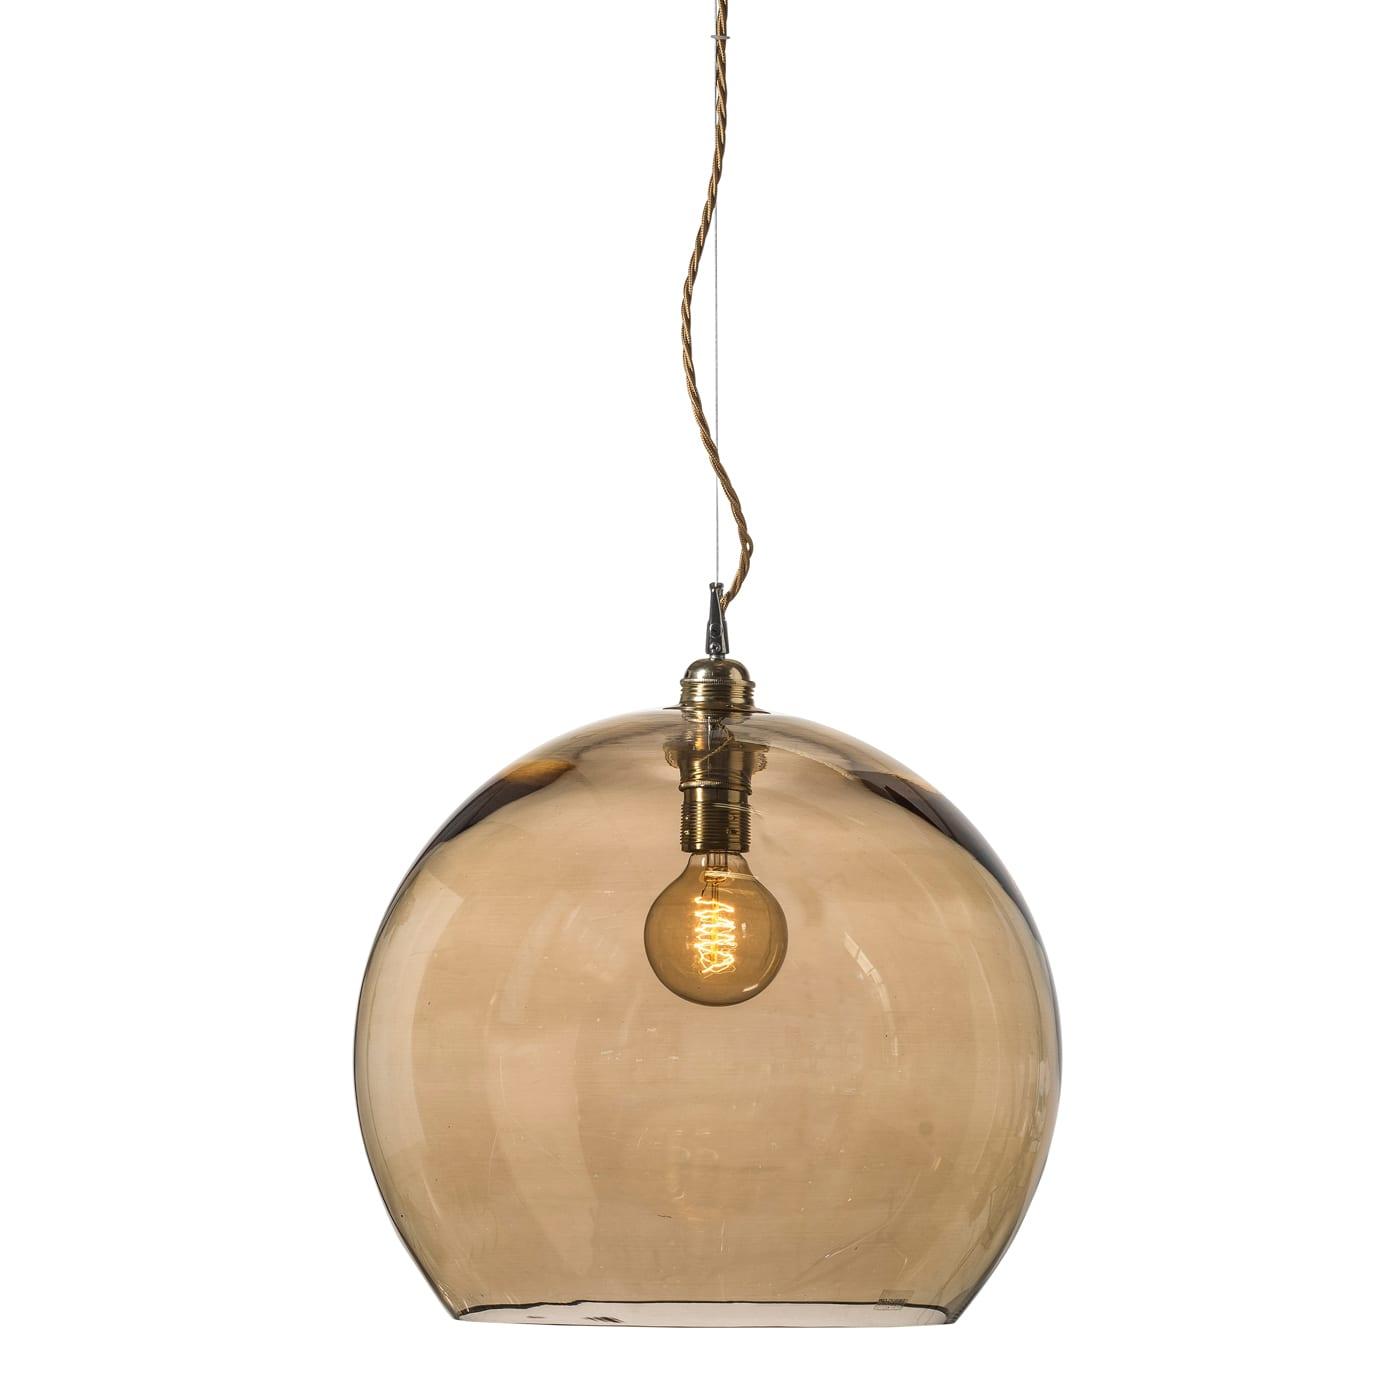 Rowan pendant lamp, chestnut brown, 39cm